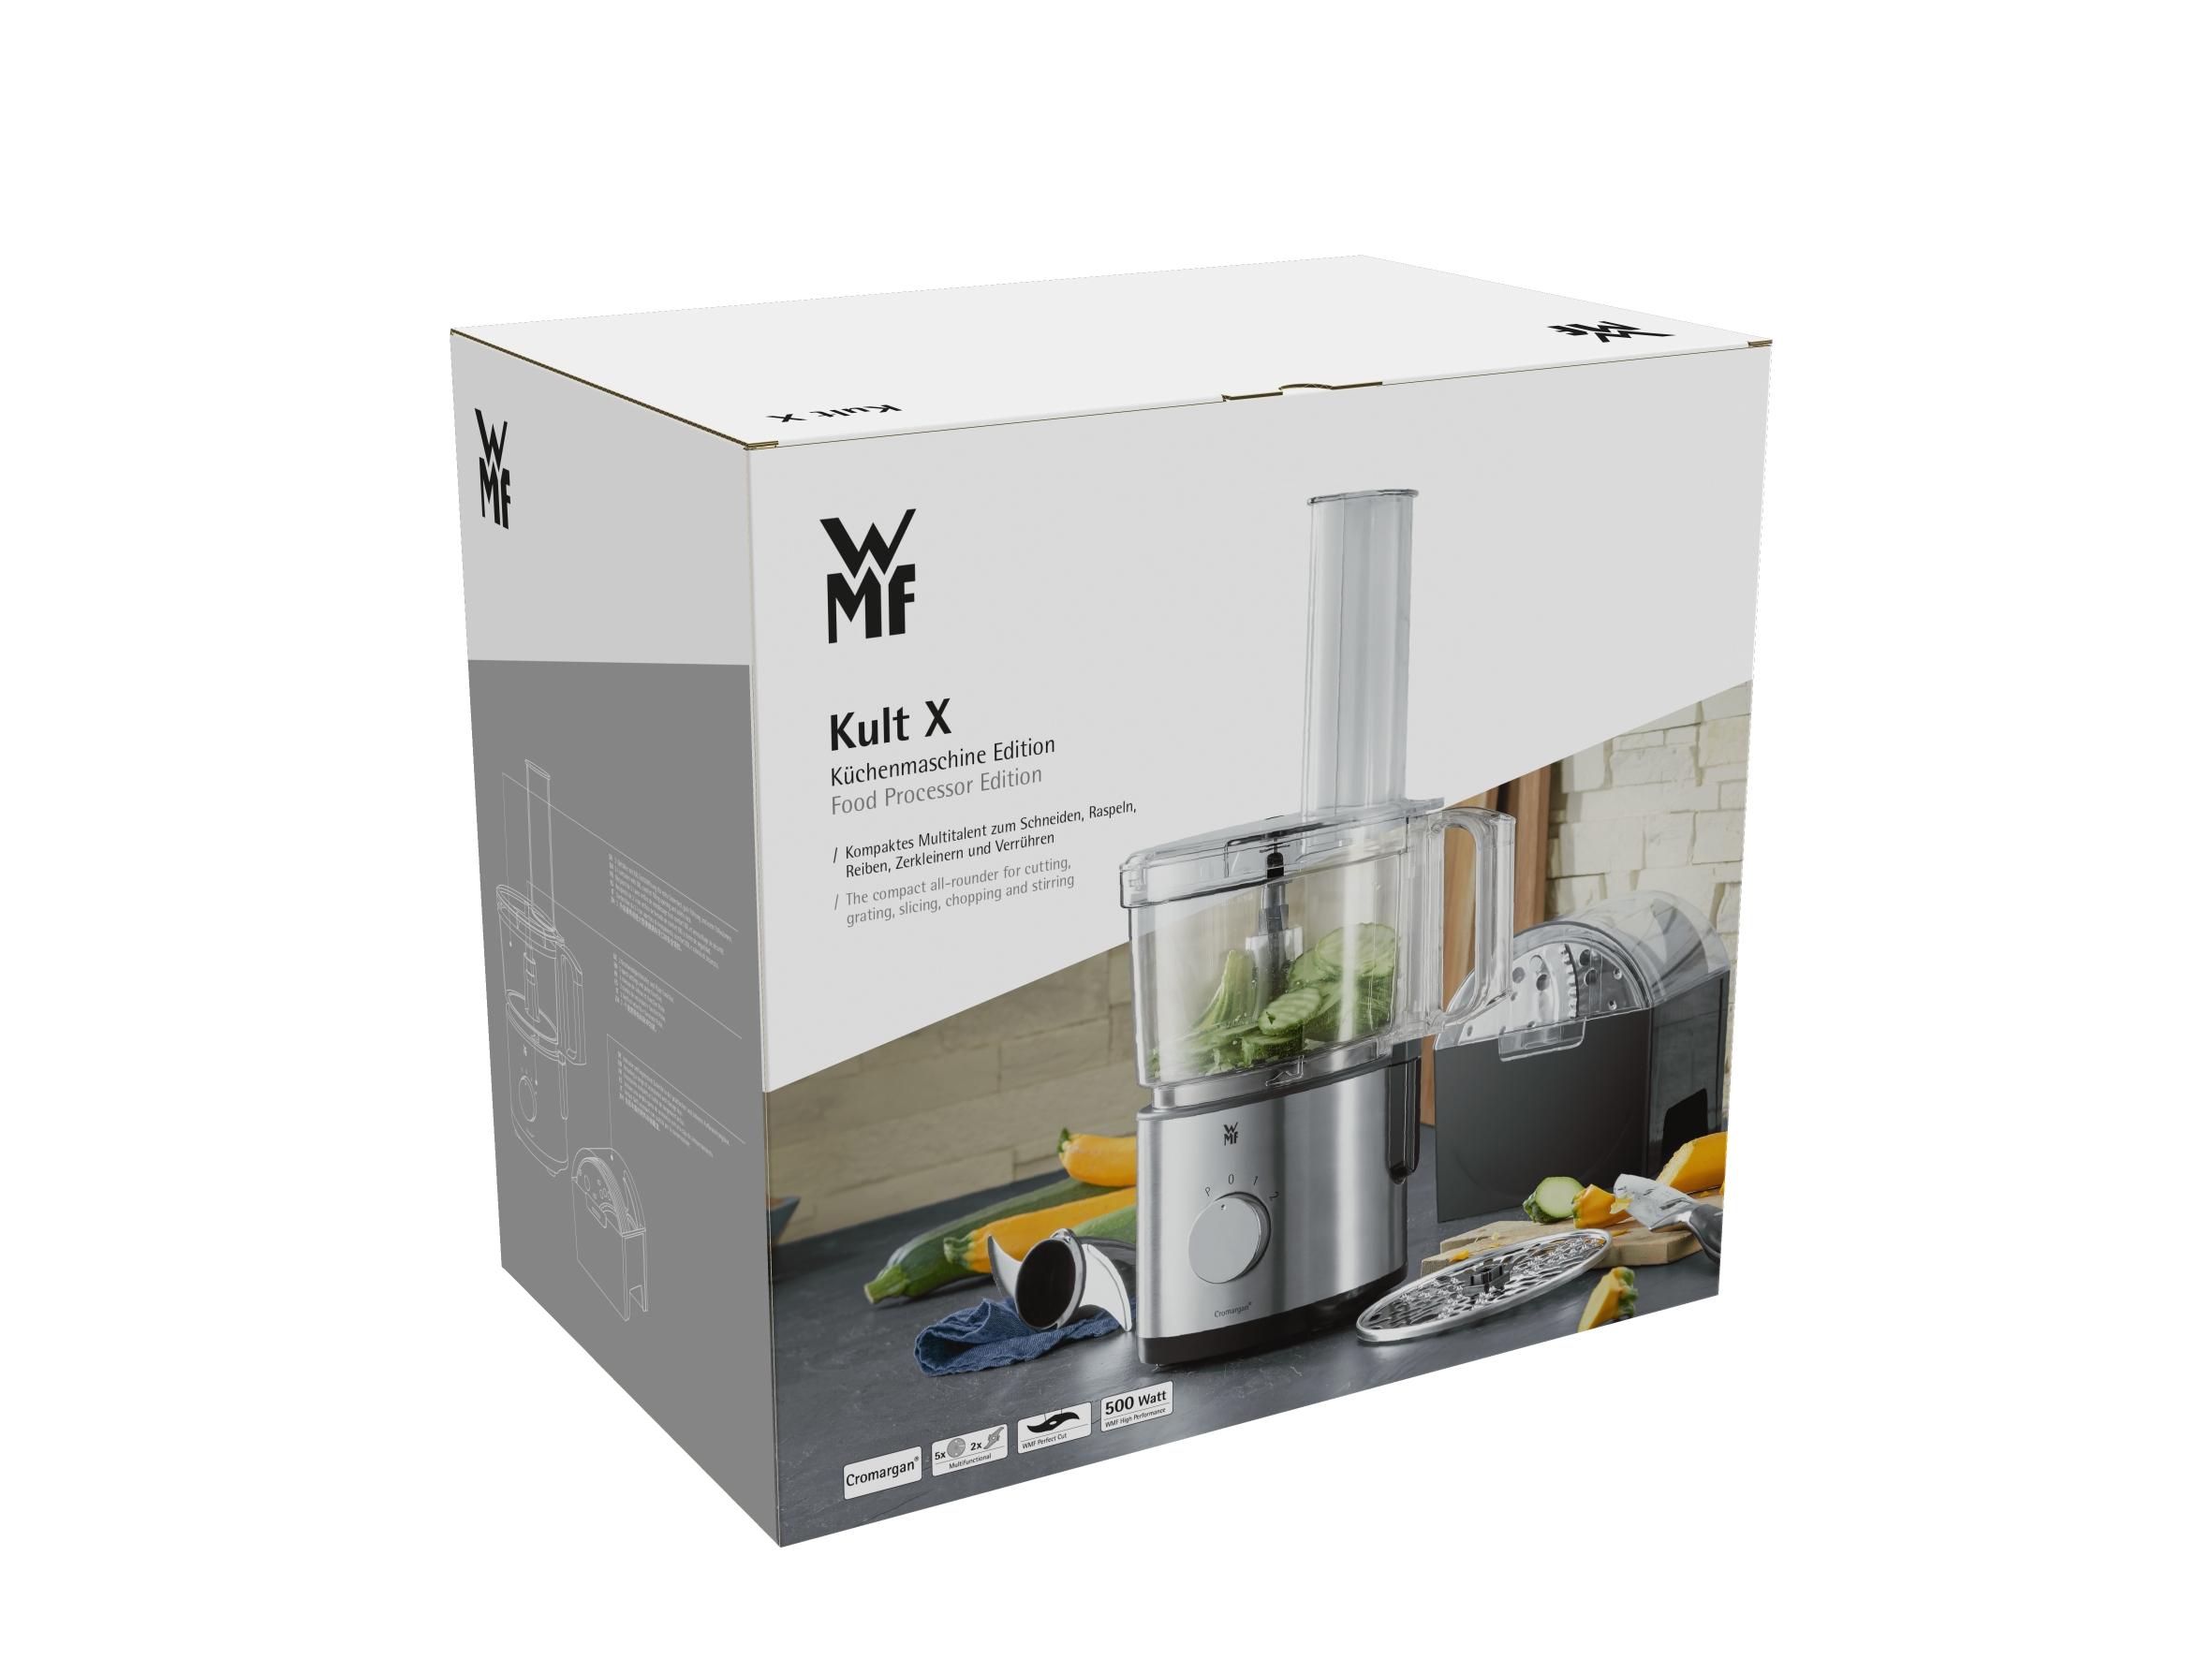 WMF Kult X Mutfak Robotu